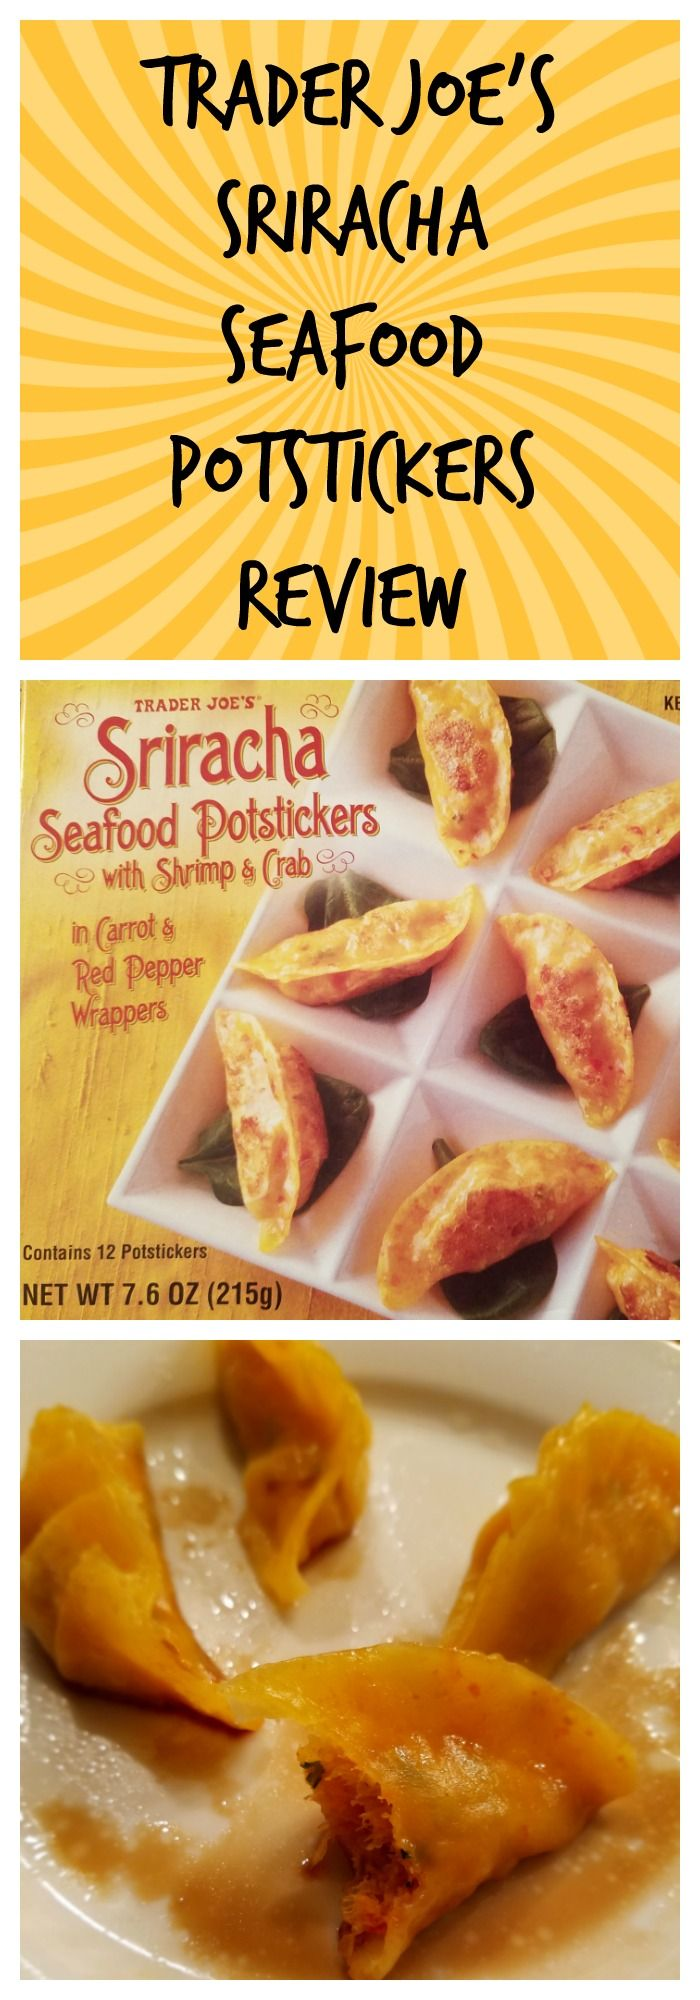 Trader Joe S Sriracha Seafood Potstickers Trader Joes Trader Joes Appetizers Frozen Meals